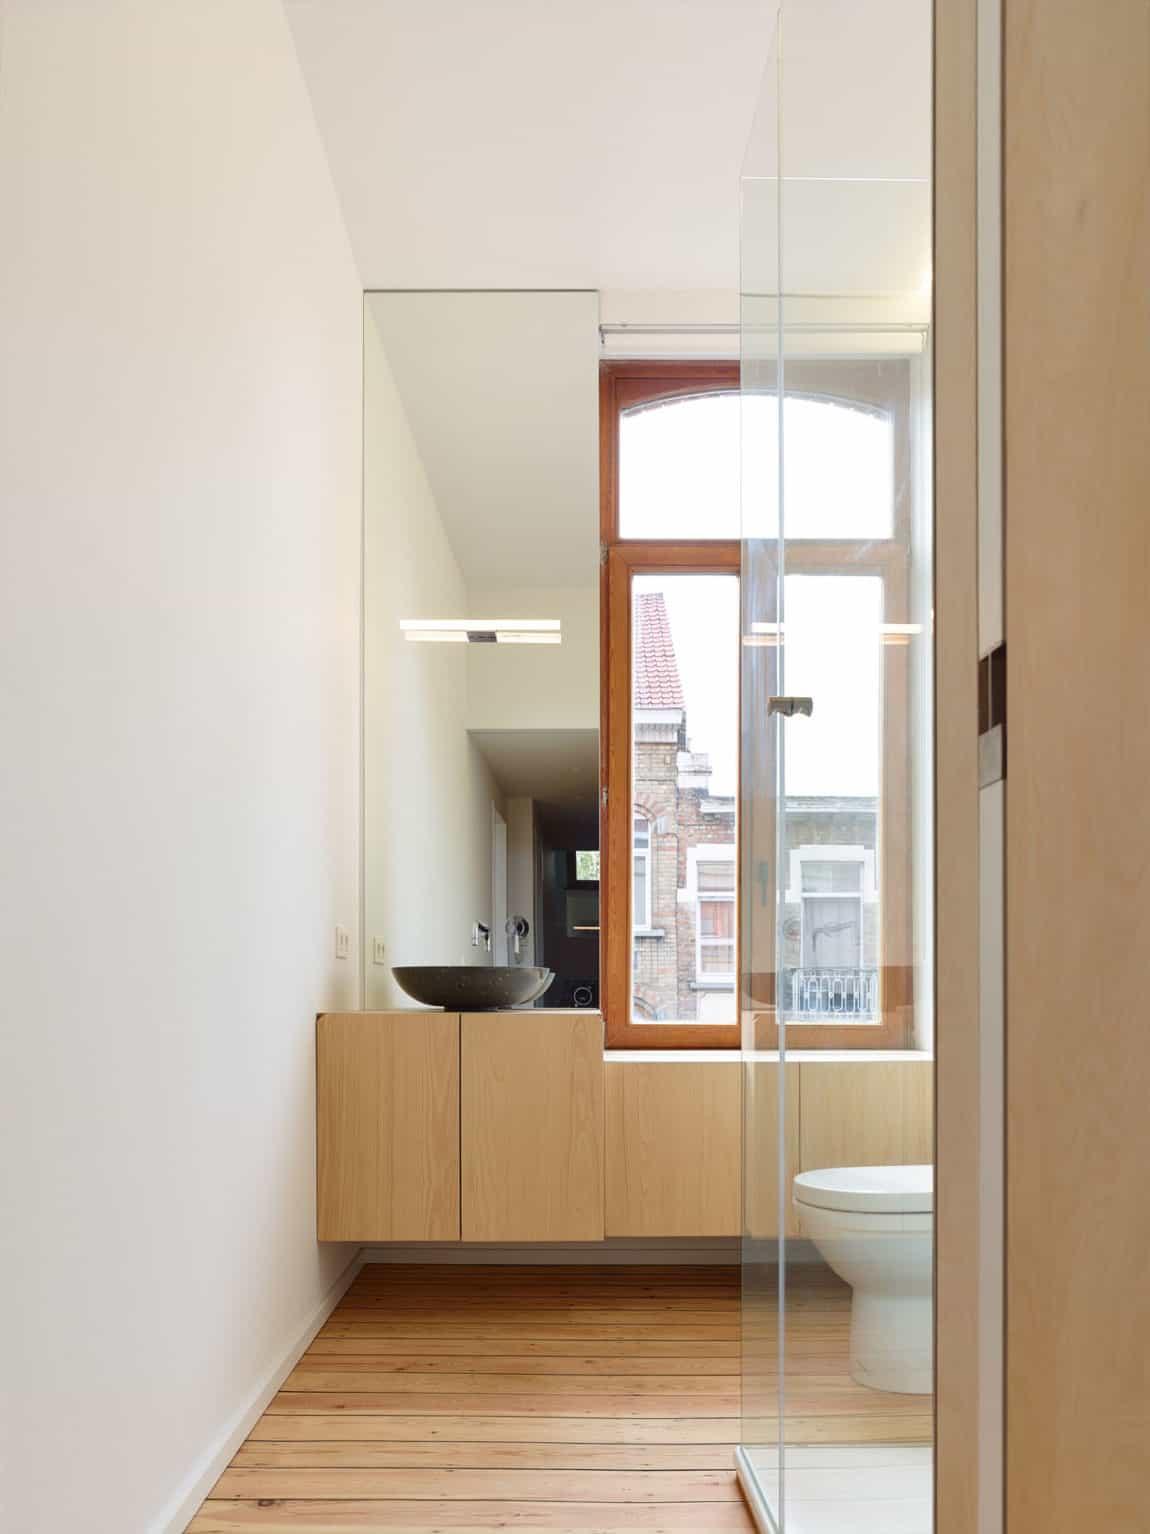 Home in Schaerbeek by Martens/Brunet Architects (21)